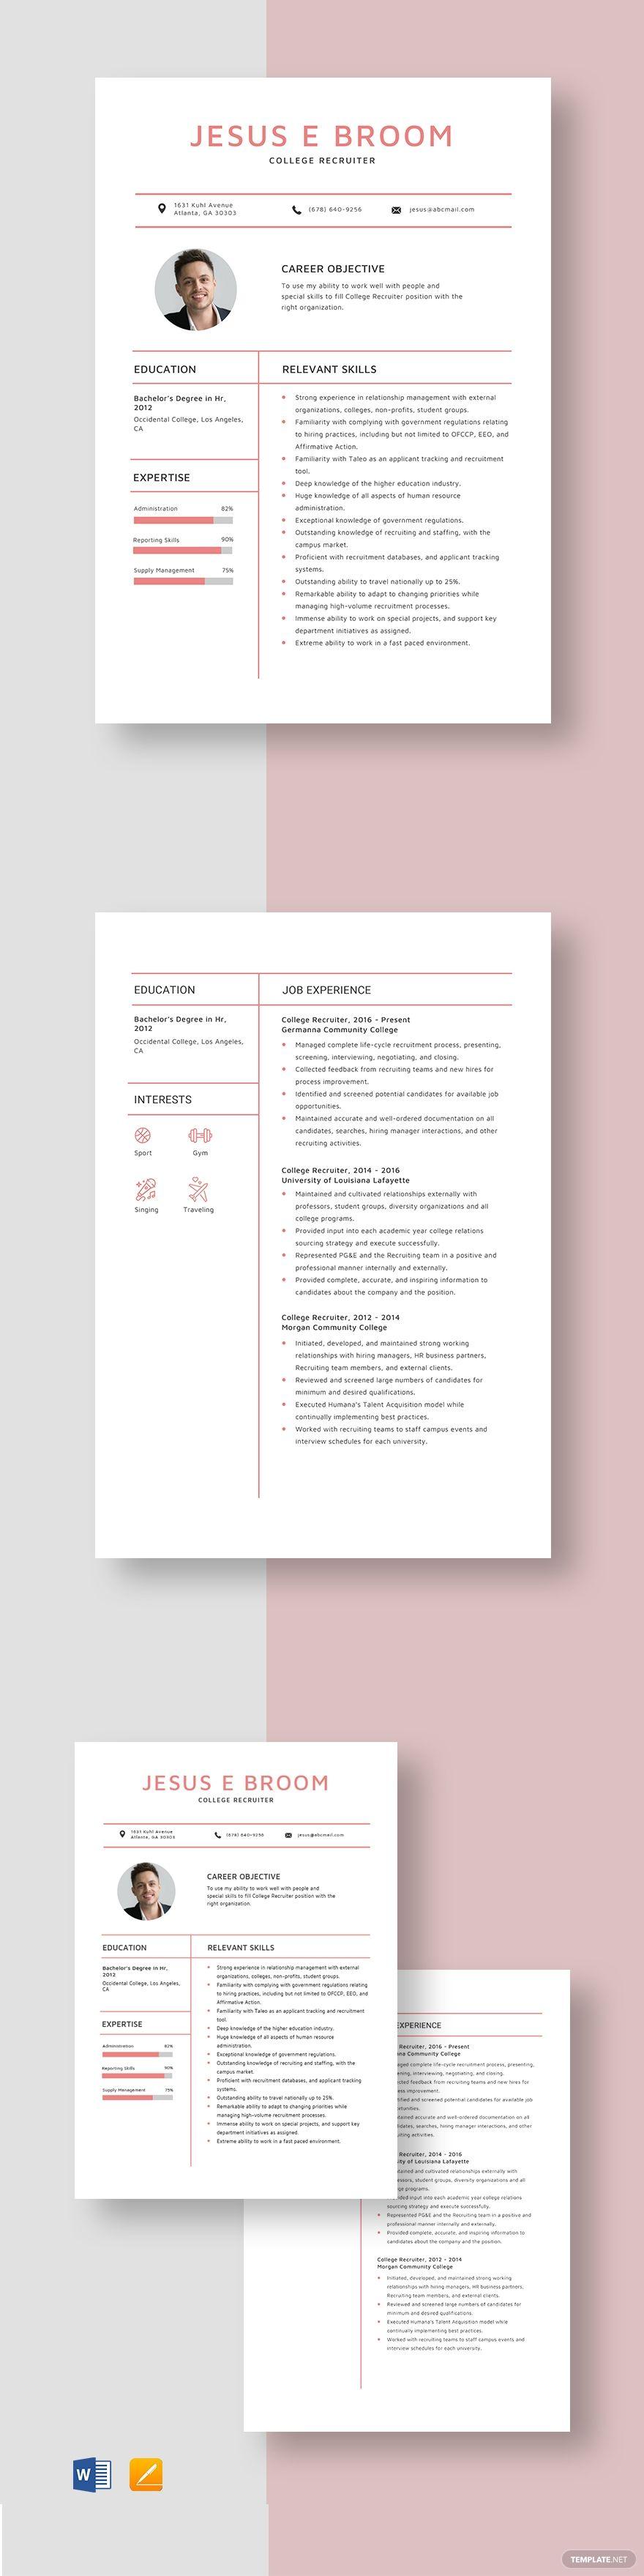 College recruiter resume template in 2020 resume